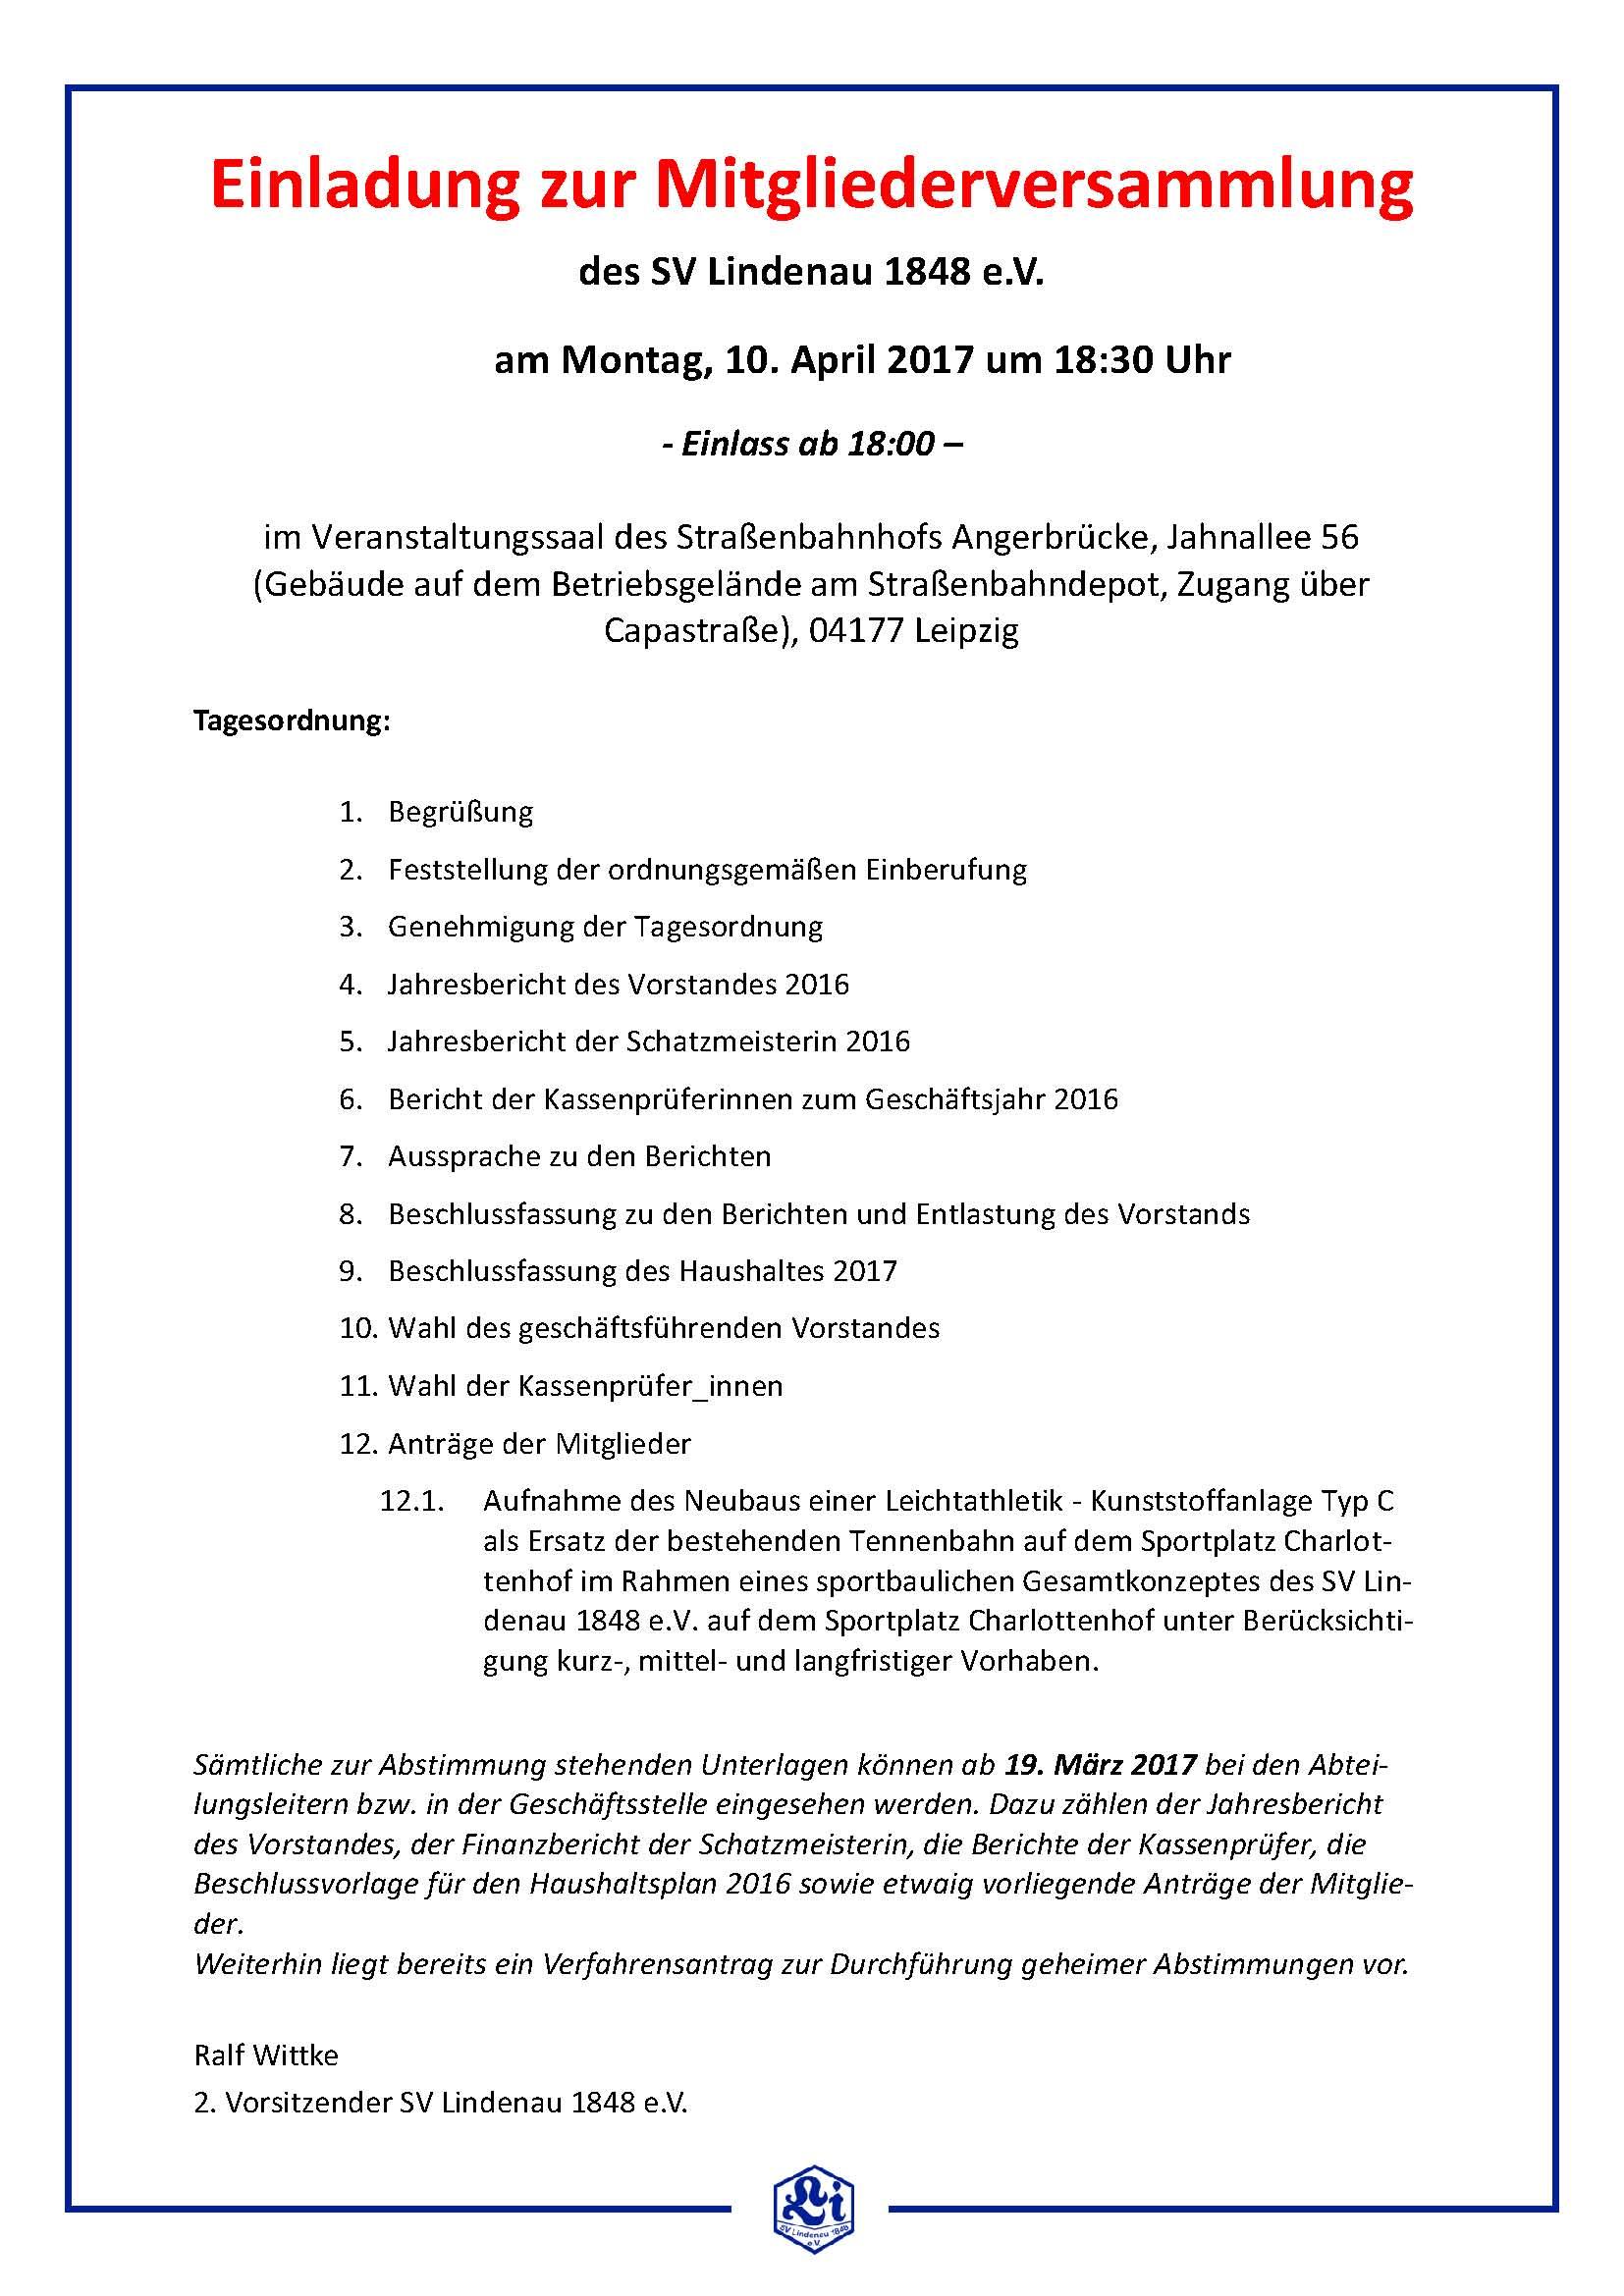 b-jugend archives - sv lindenau 1848 e.v. - fußball -, Einladung